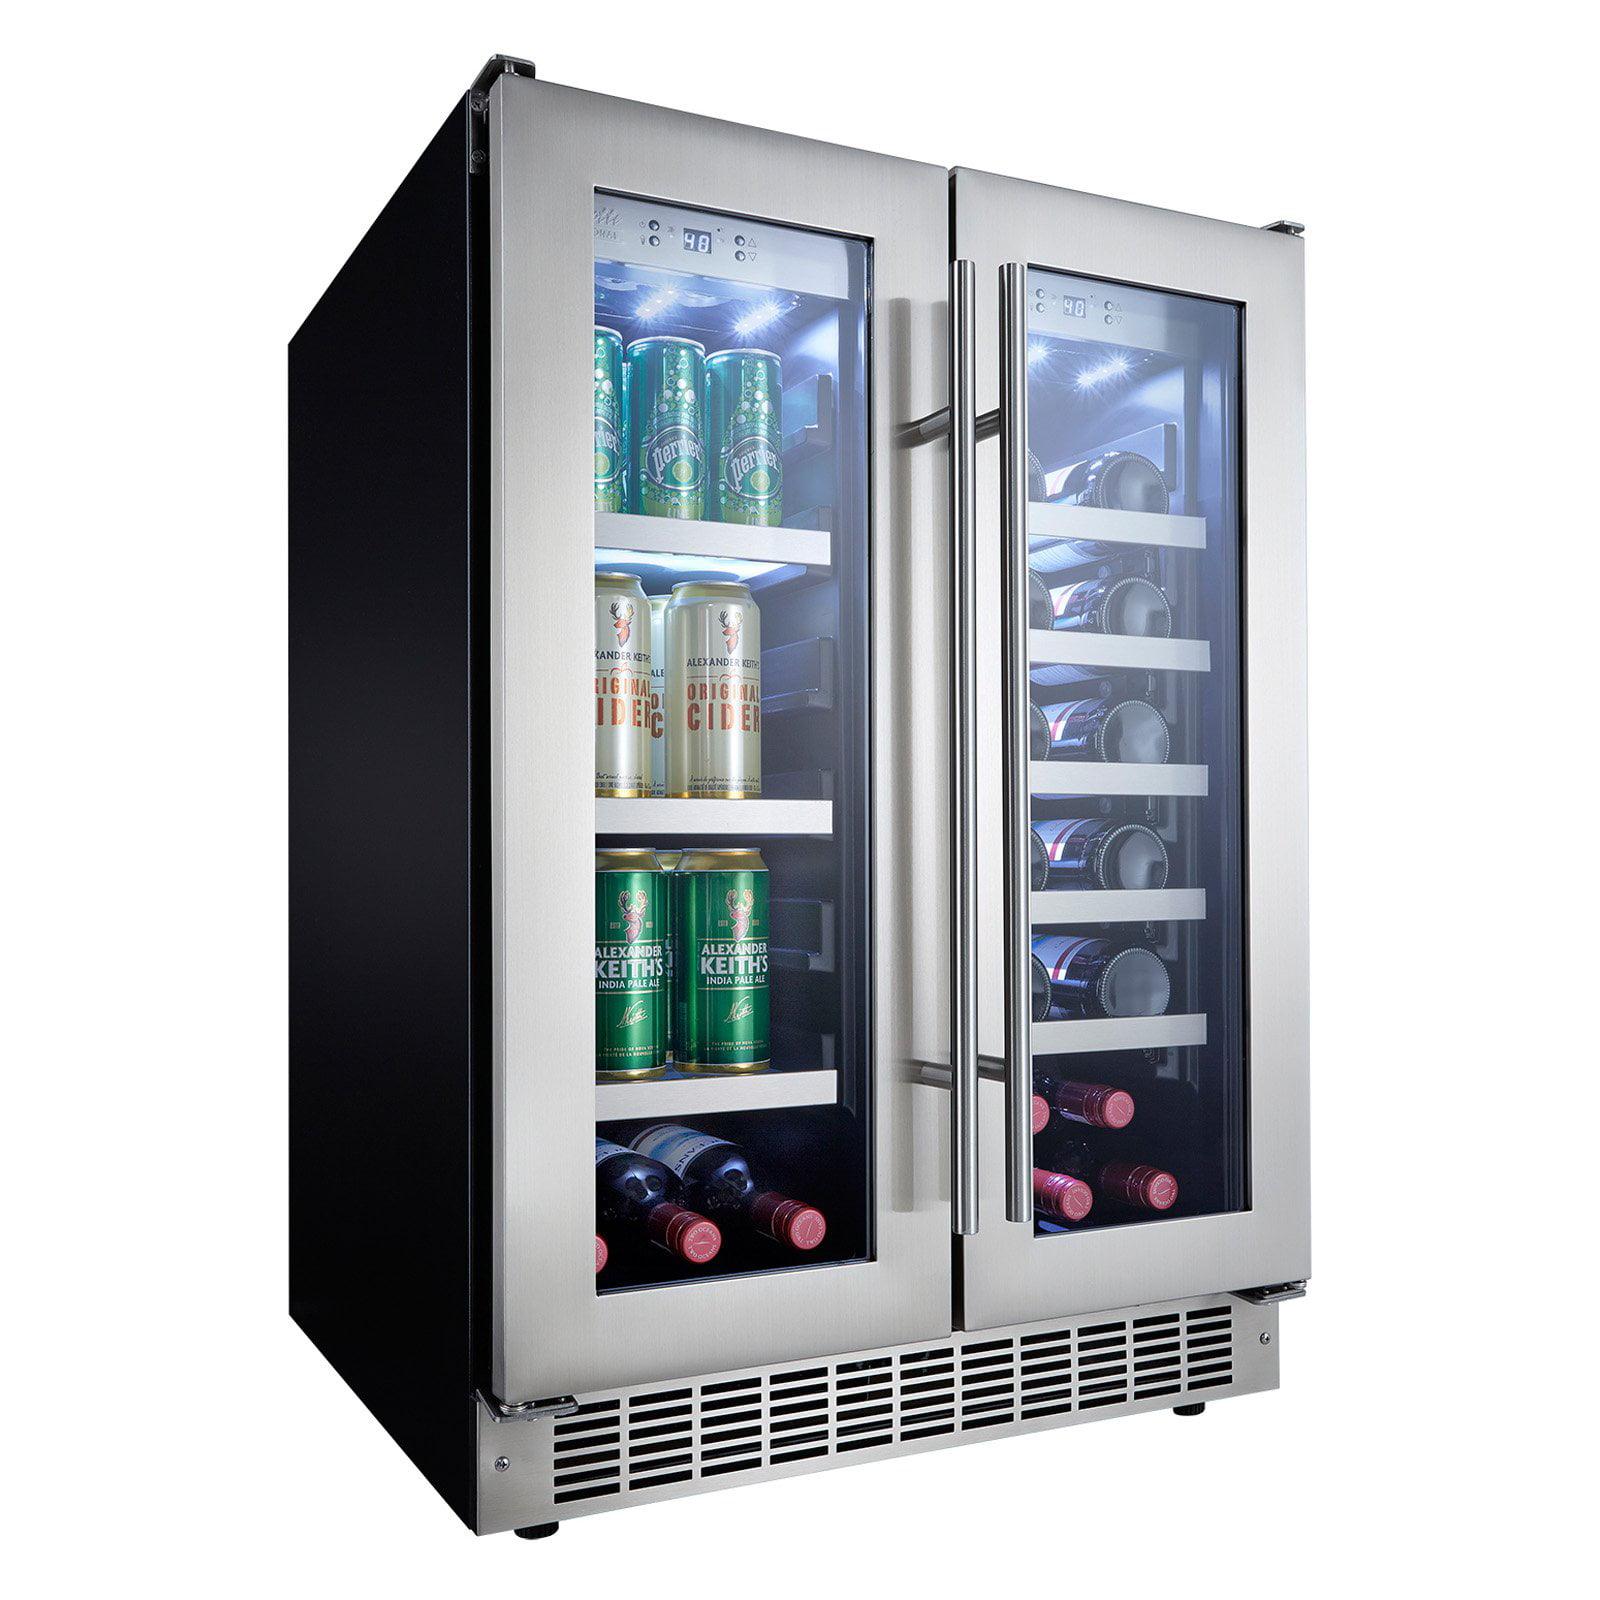 Silhouette Professional 4.7 cu. ft. Built-In Beverage Center